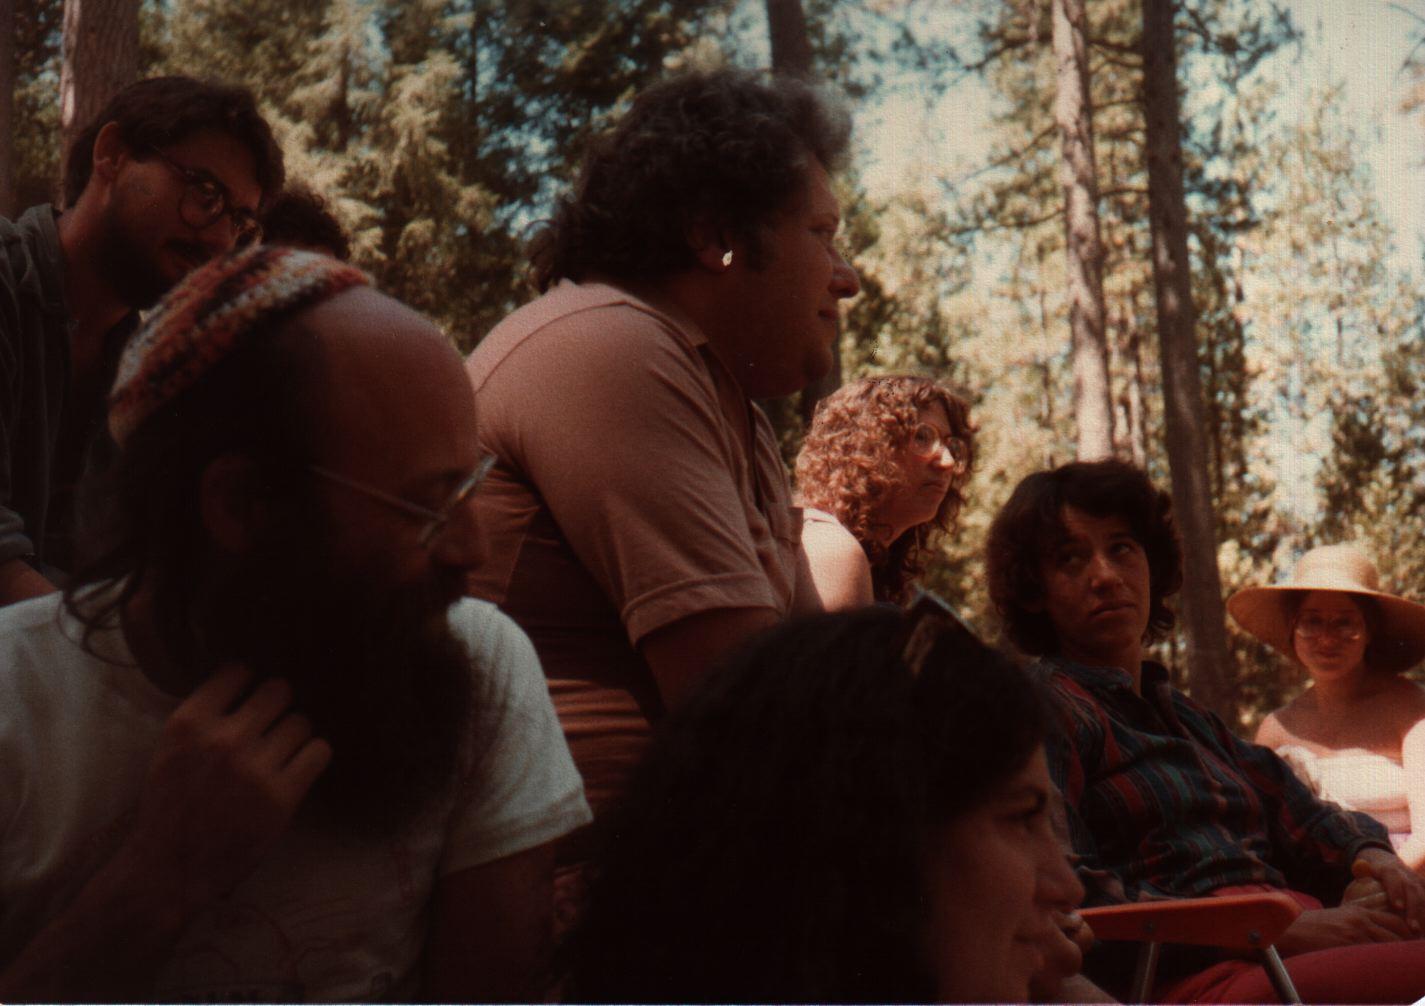 84 Joys  Folks listening during closing circle, Avram Davis, Reuven Goldfarb, Barry Barkan, Debby Barkan, Ilana Schatz,Miriam Bluestone, Sara Shendelman copy.jpg